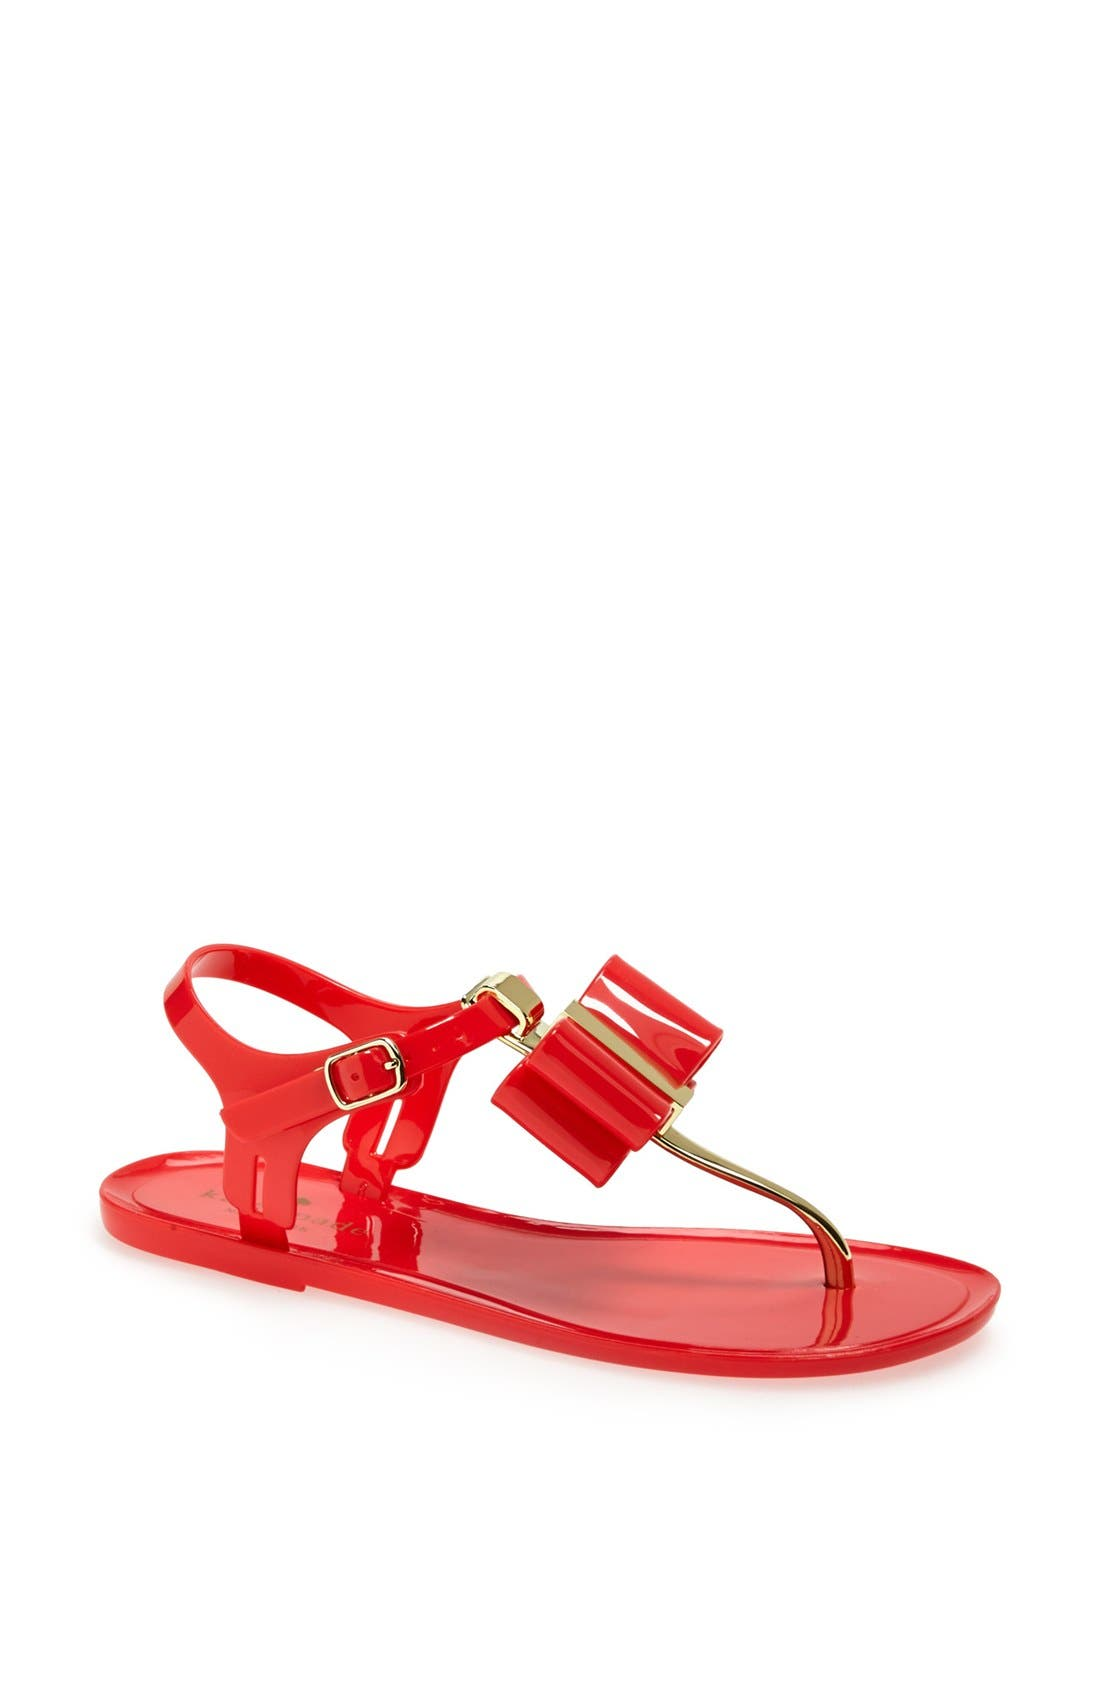 Main Image - kate spade new york 'filo' jelly sandal